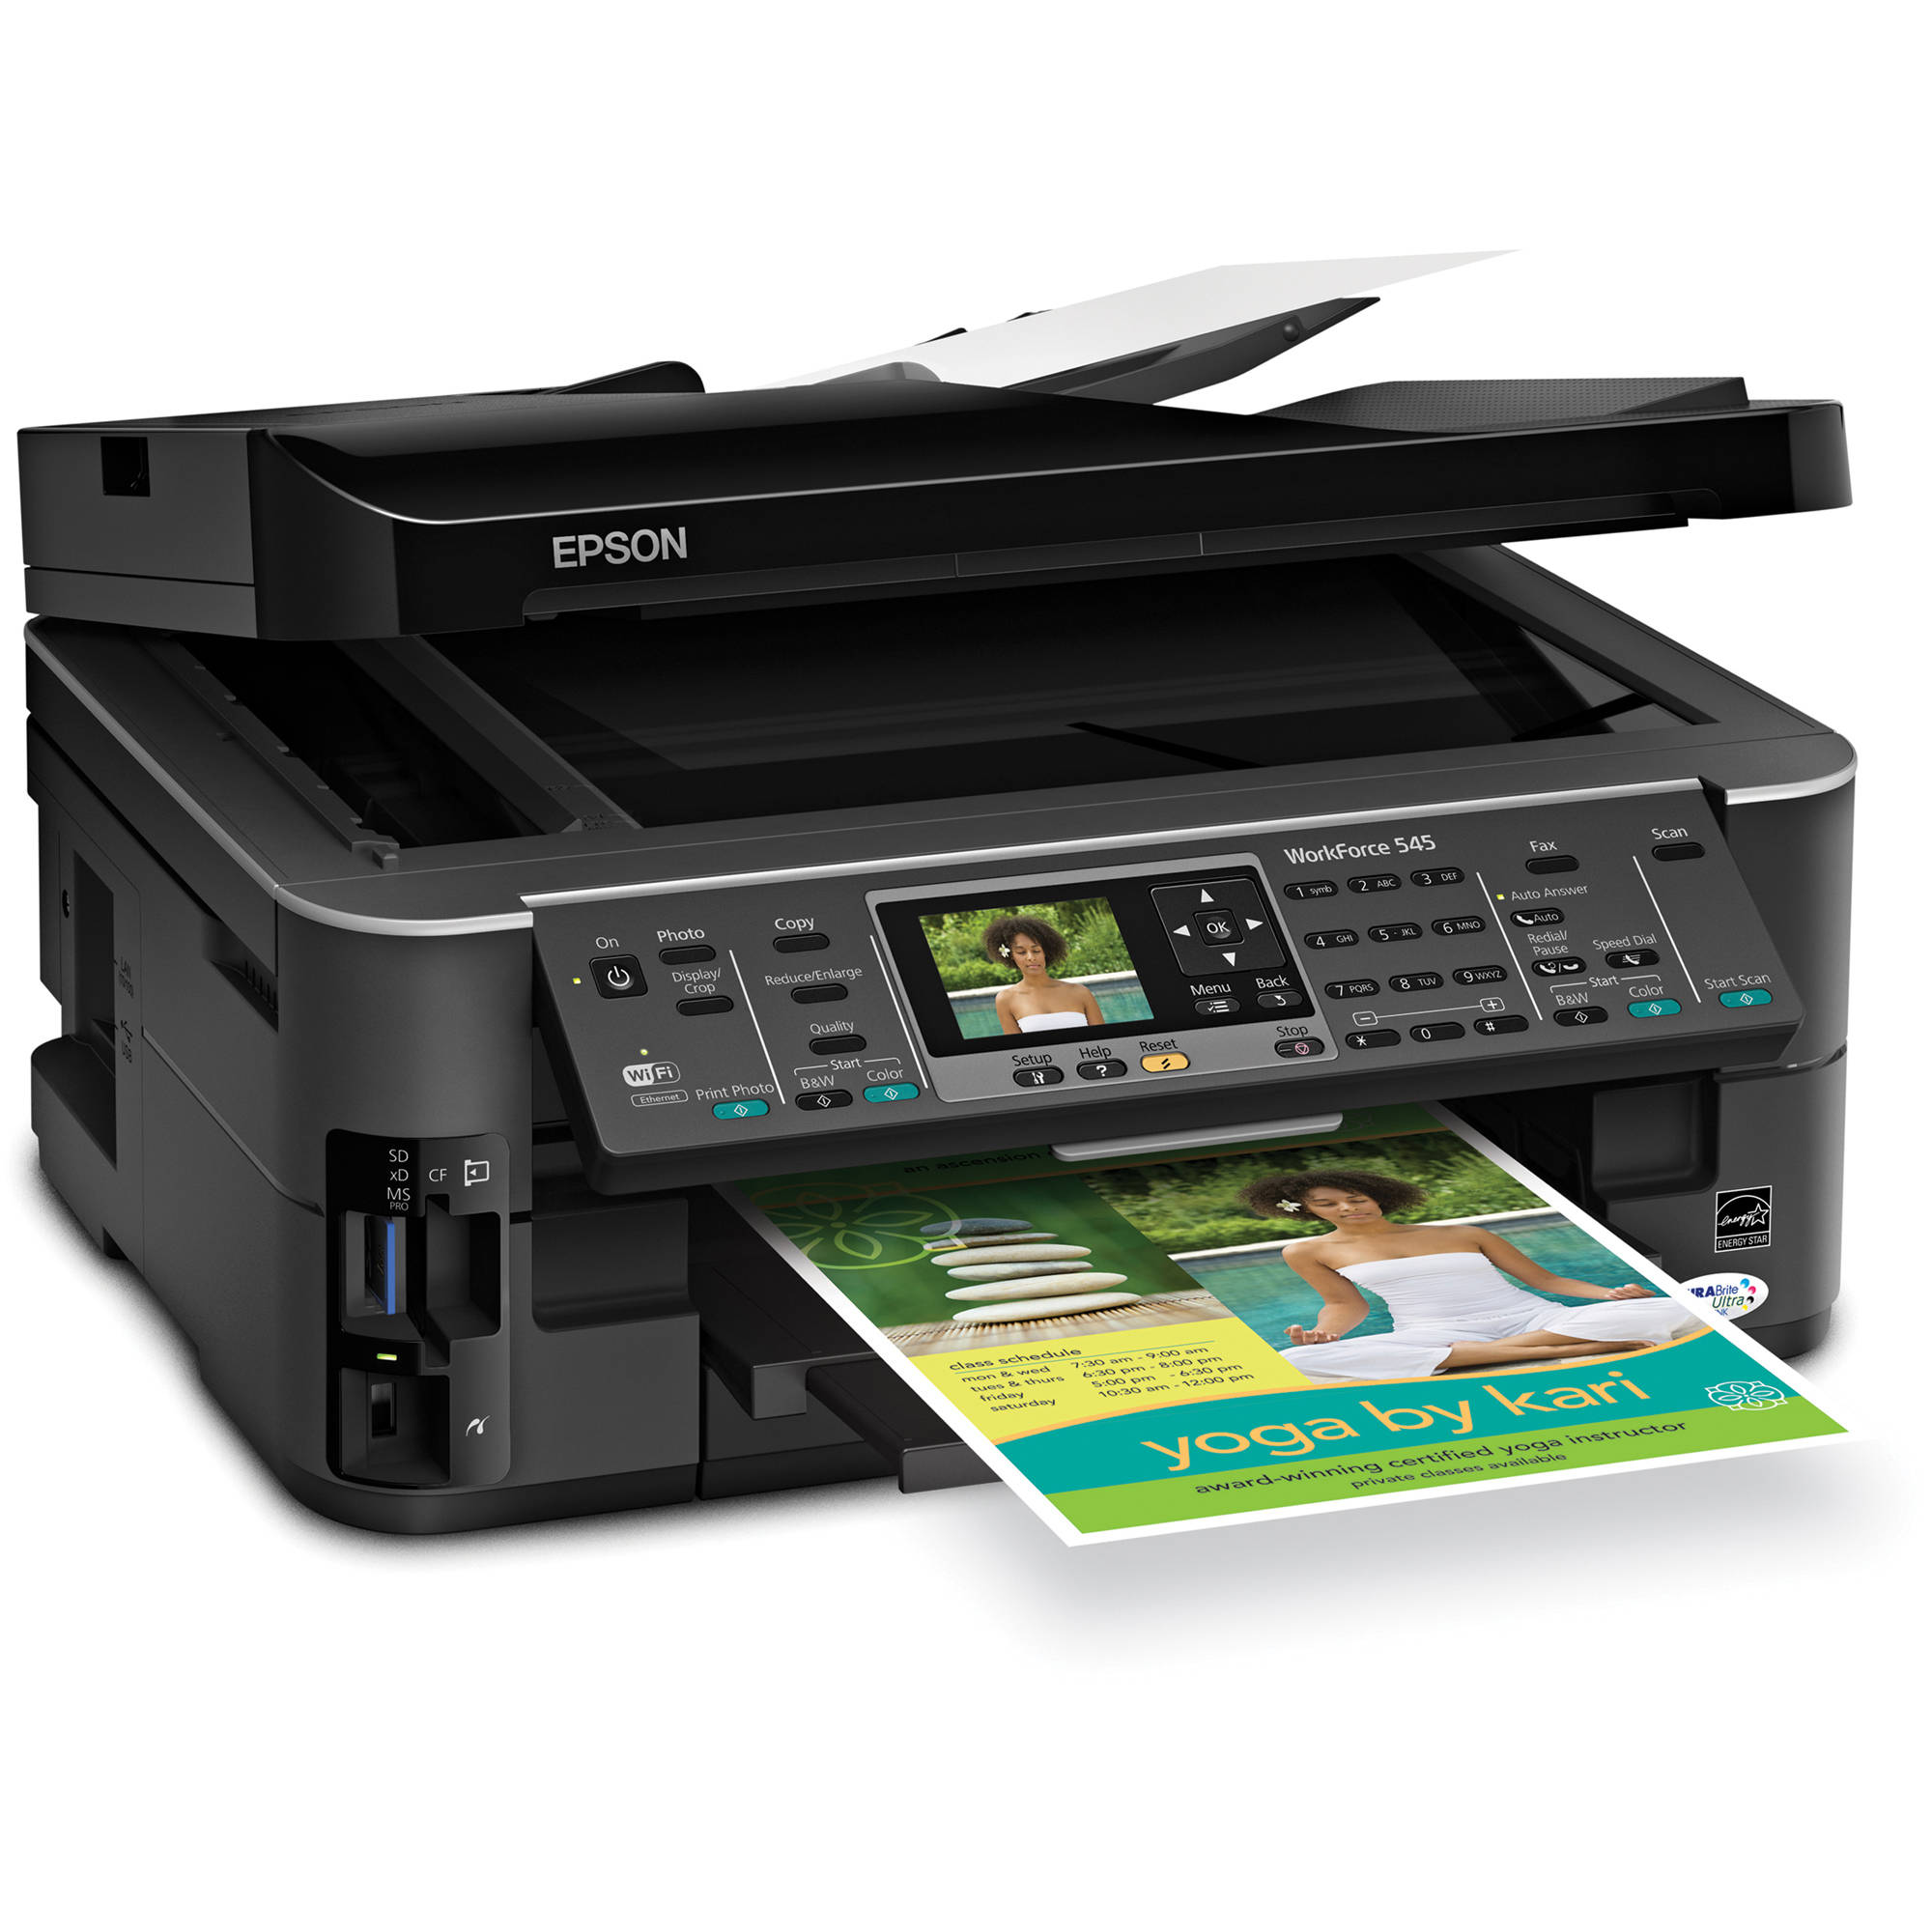 Epson WorkForce 545 All-in-One Color Inkjet Printer